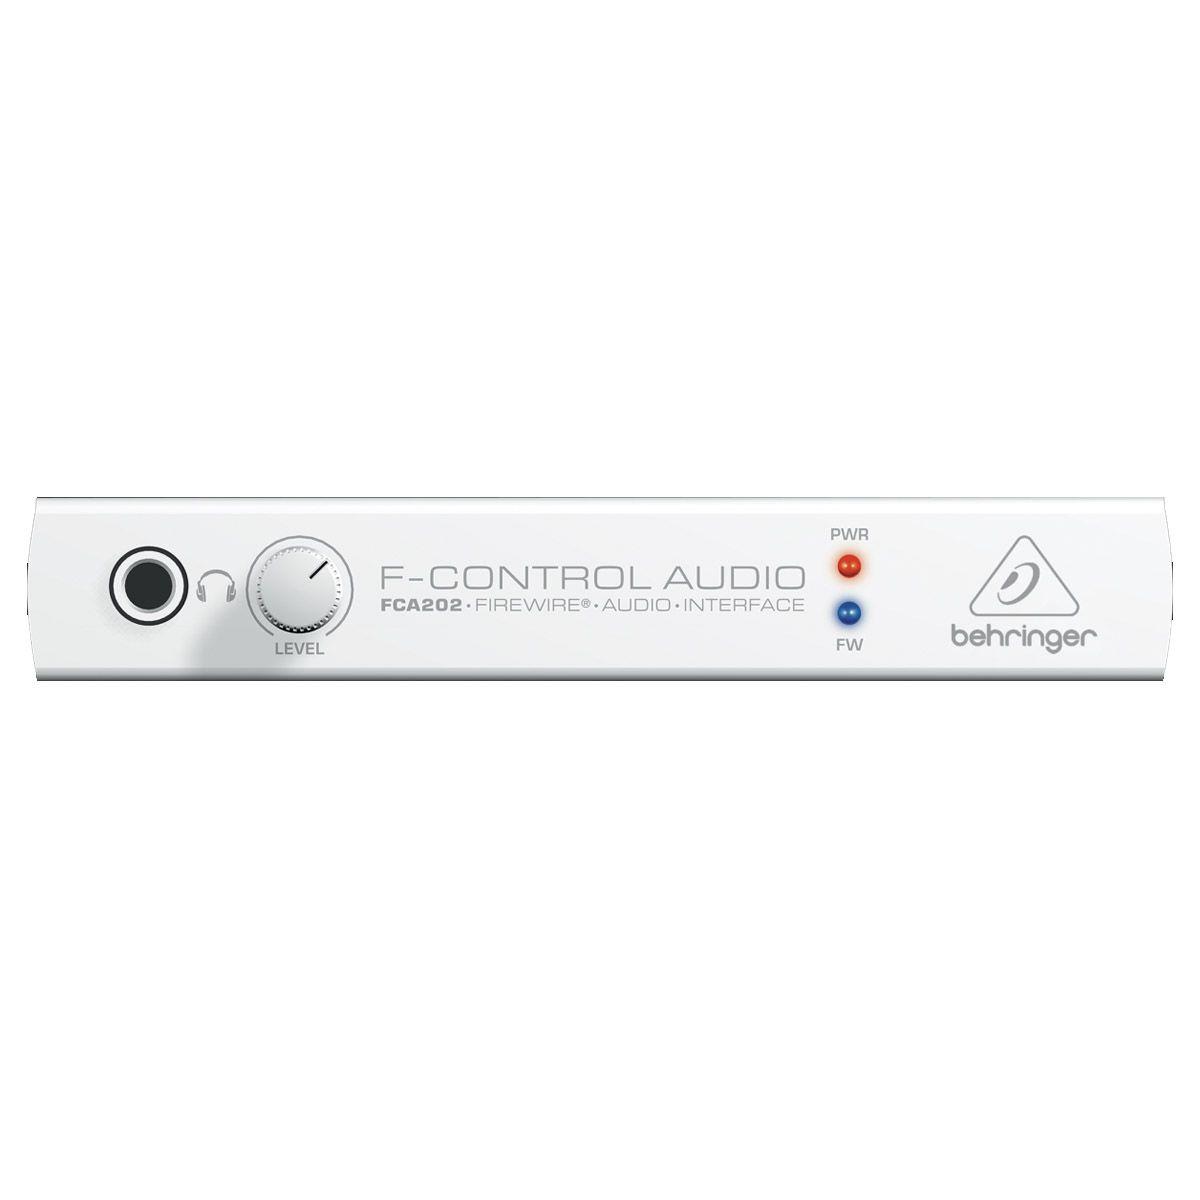 Conversor de audio 2X2 FireWire 4 pinos Behringer FCA202